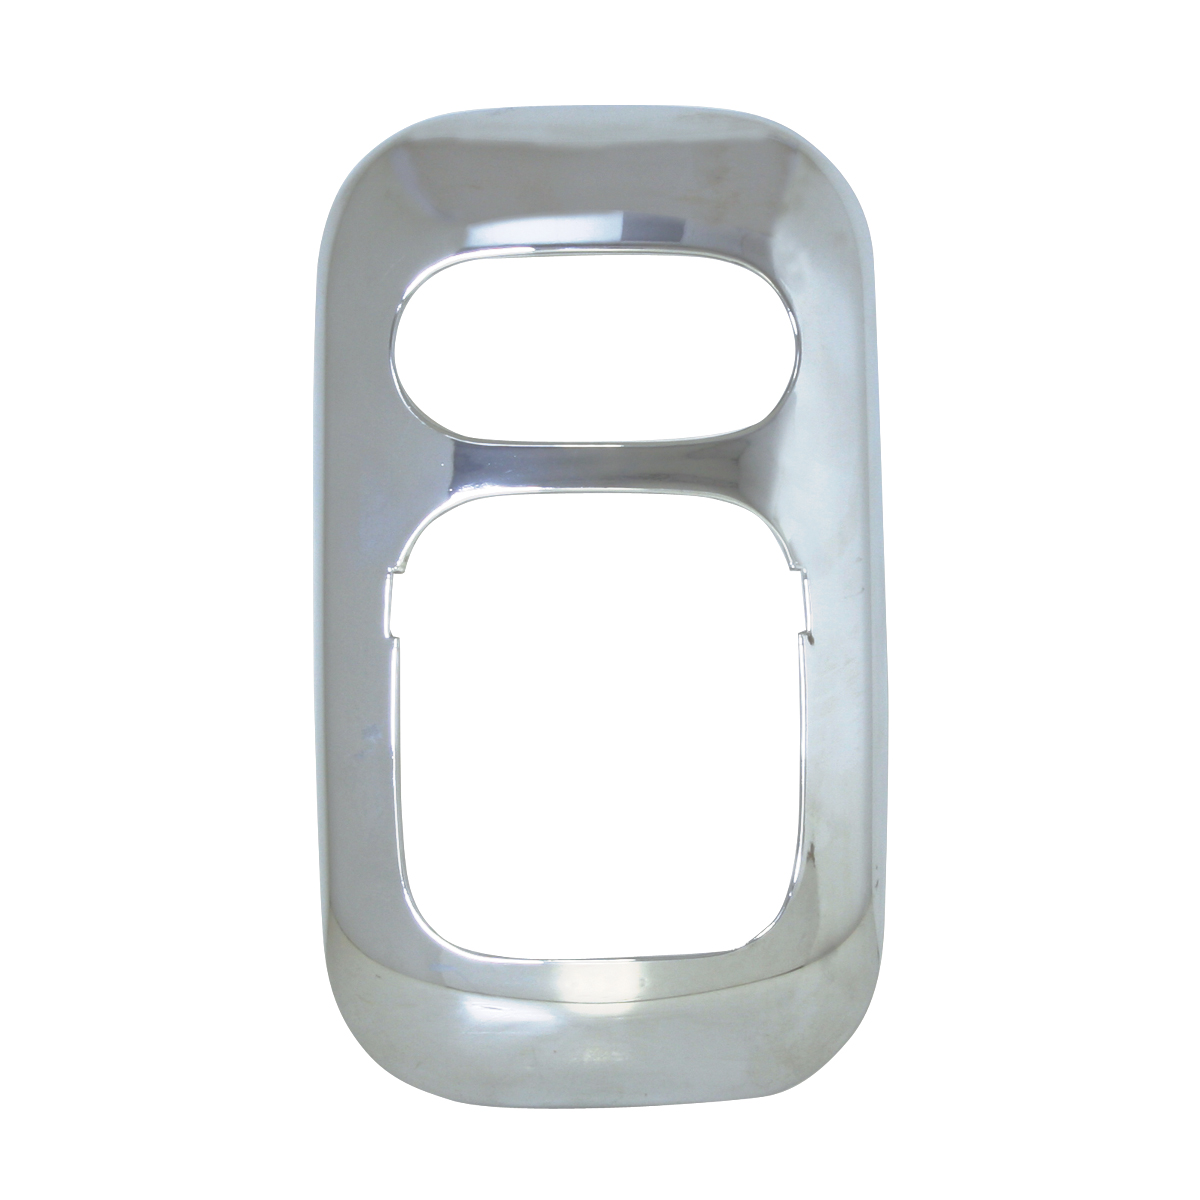 67829 Chrome Plastic Dome Light Cover for FL Columbia/Coronado